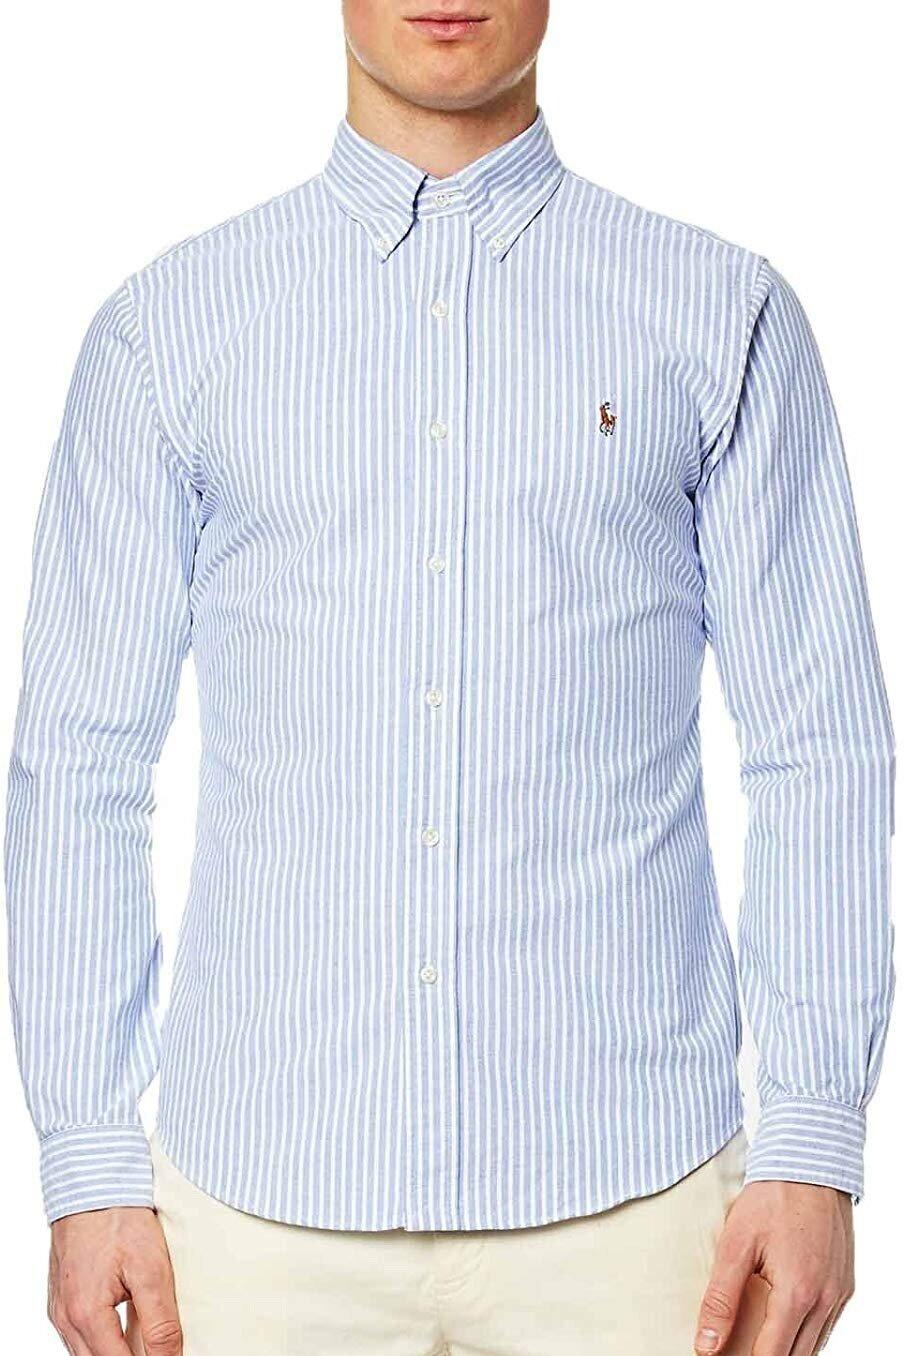 △ Ralph Lauren Mens Button Down Pinpoint Oxford Shirt  US$55.99 (~HK$440)